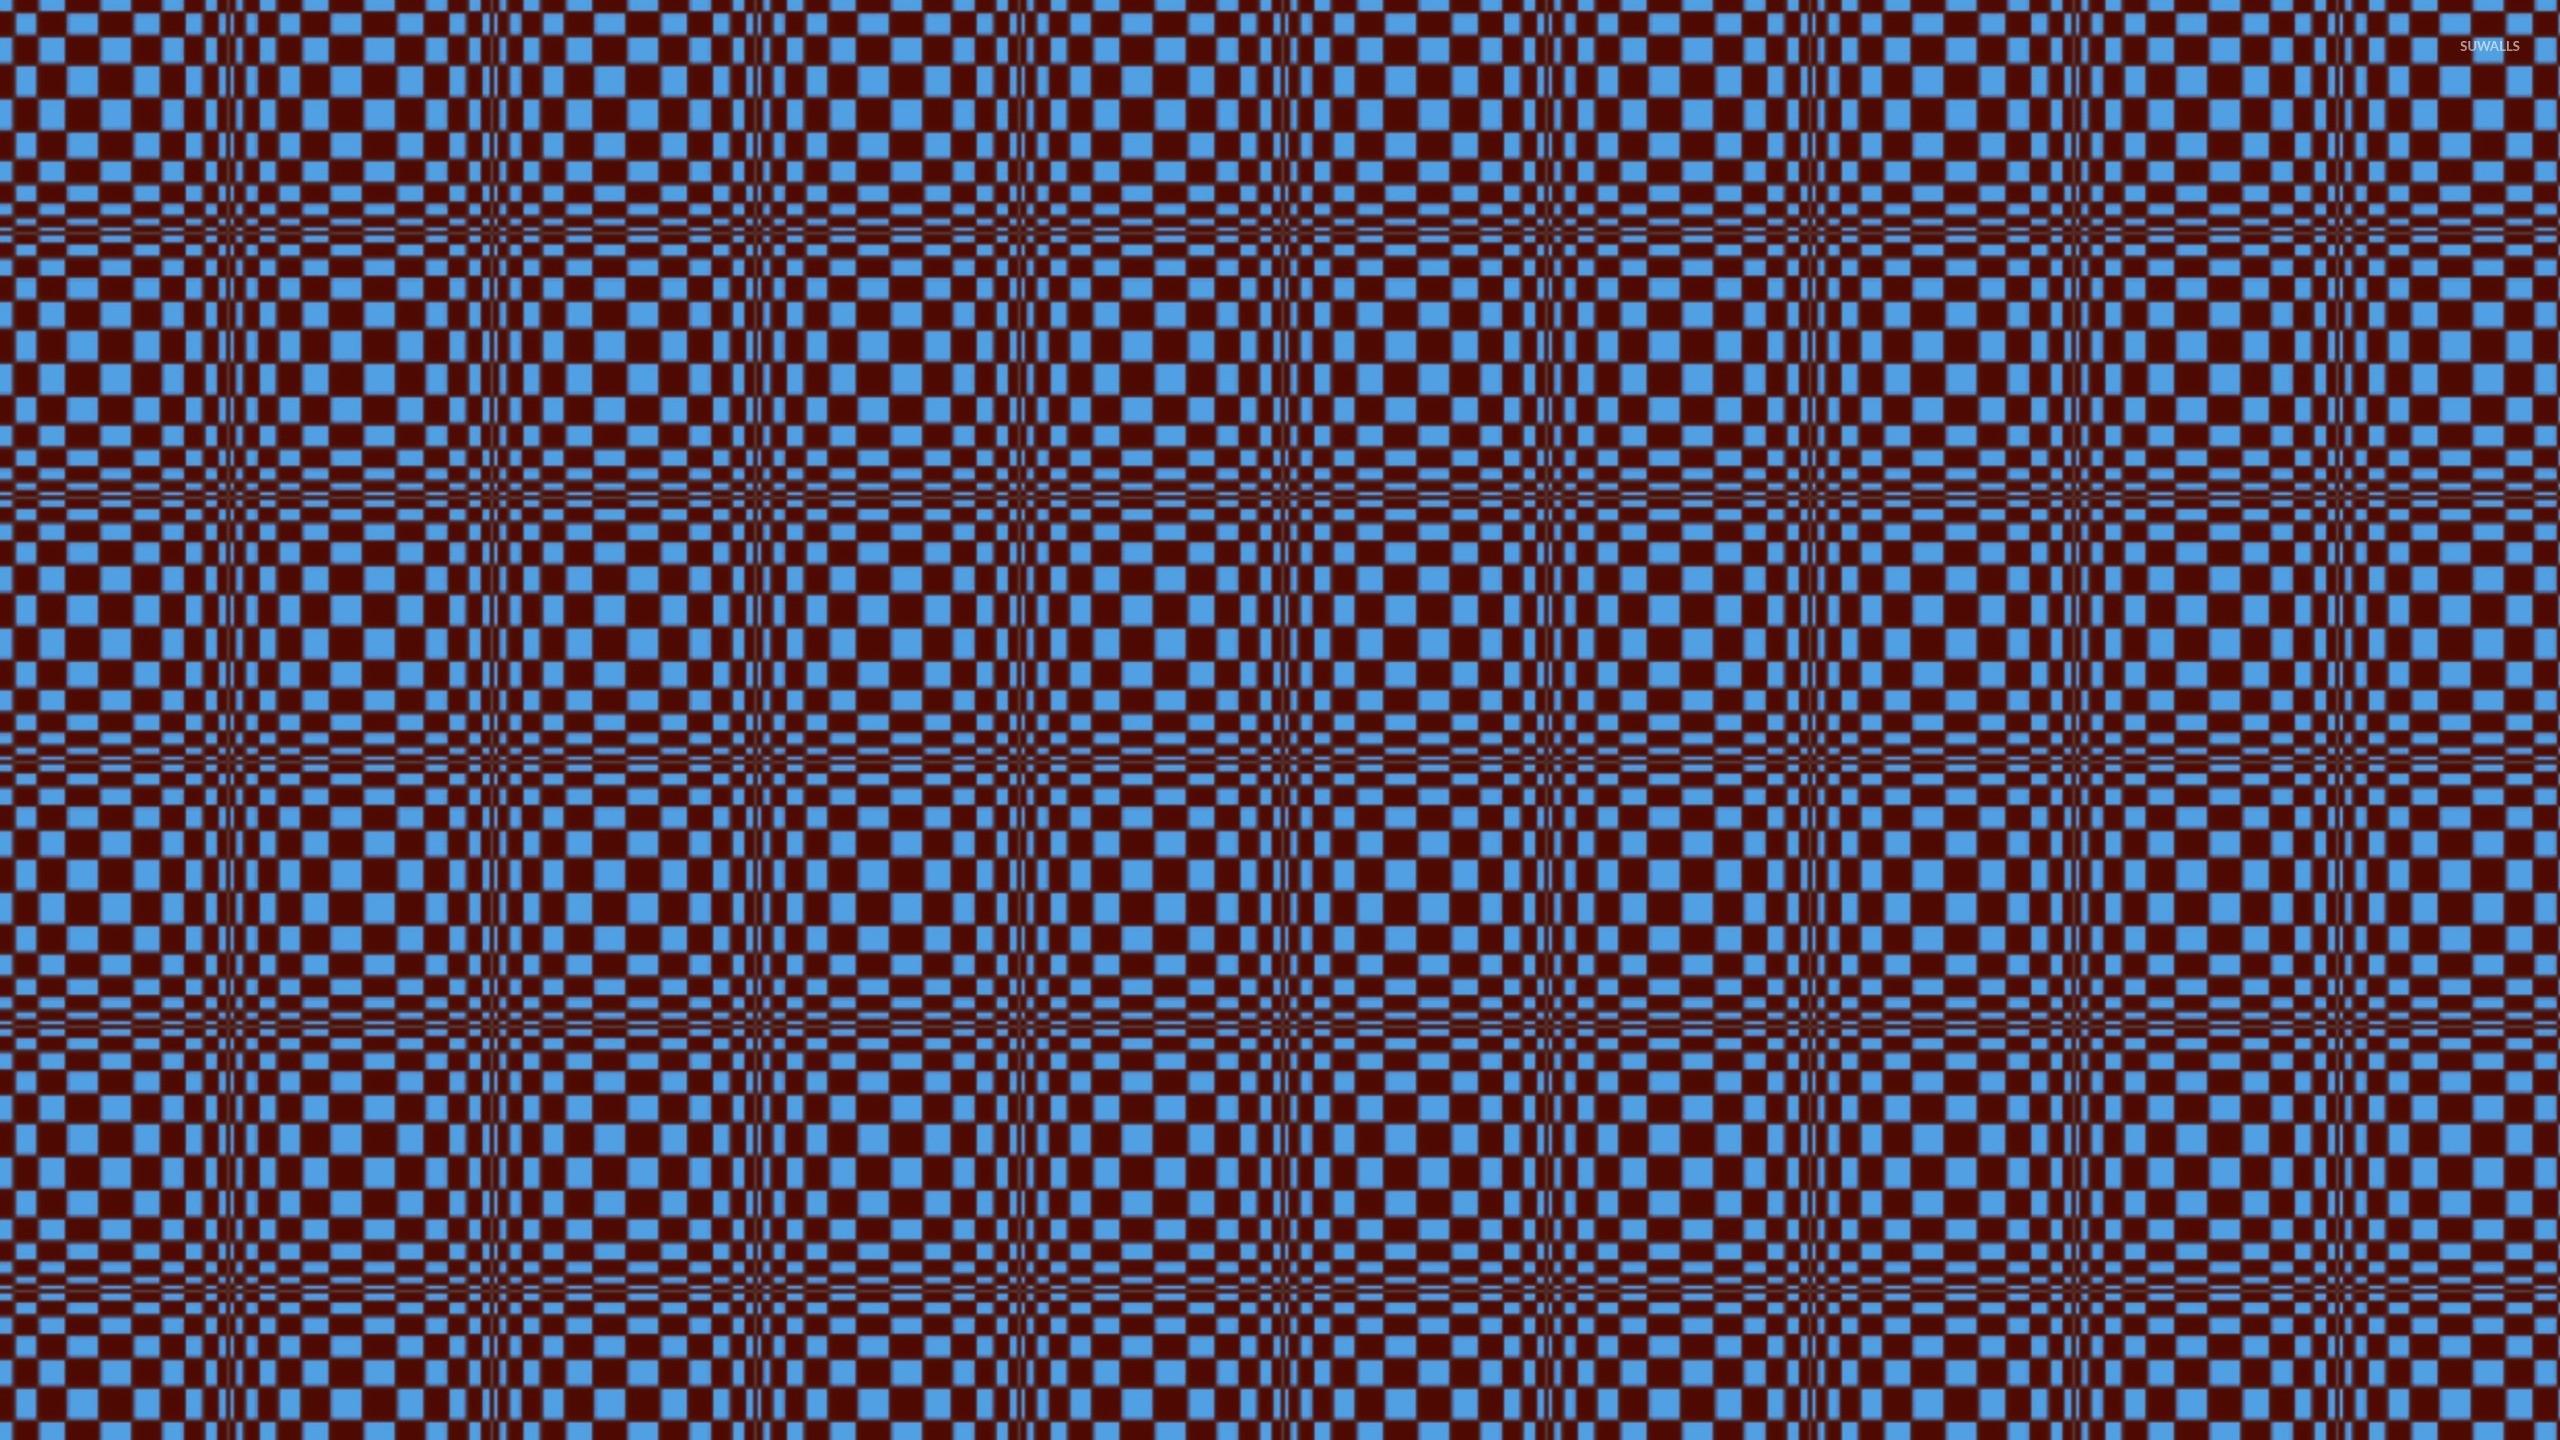 Hypnotic square pattern wallpaper jpg